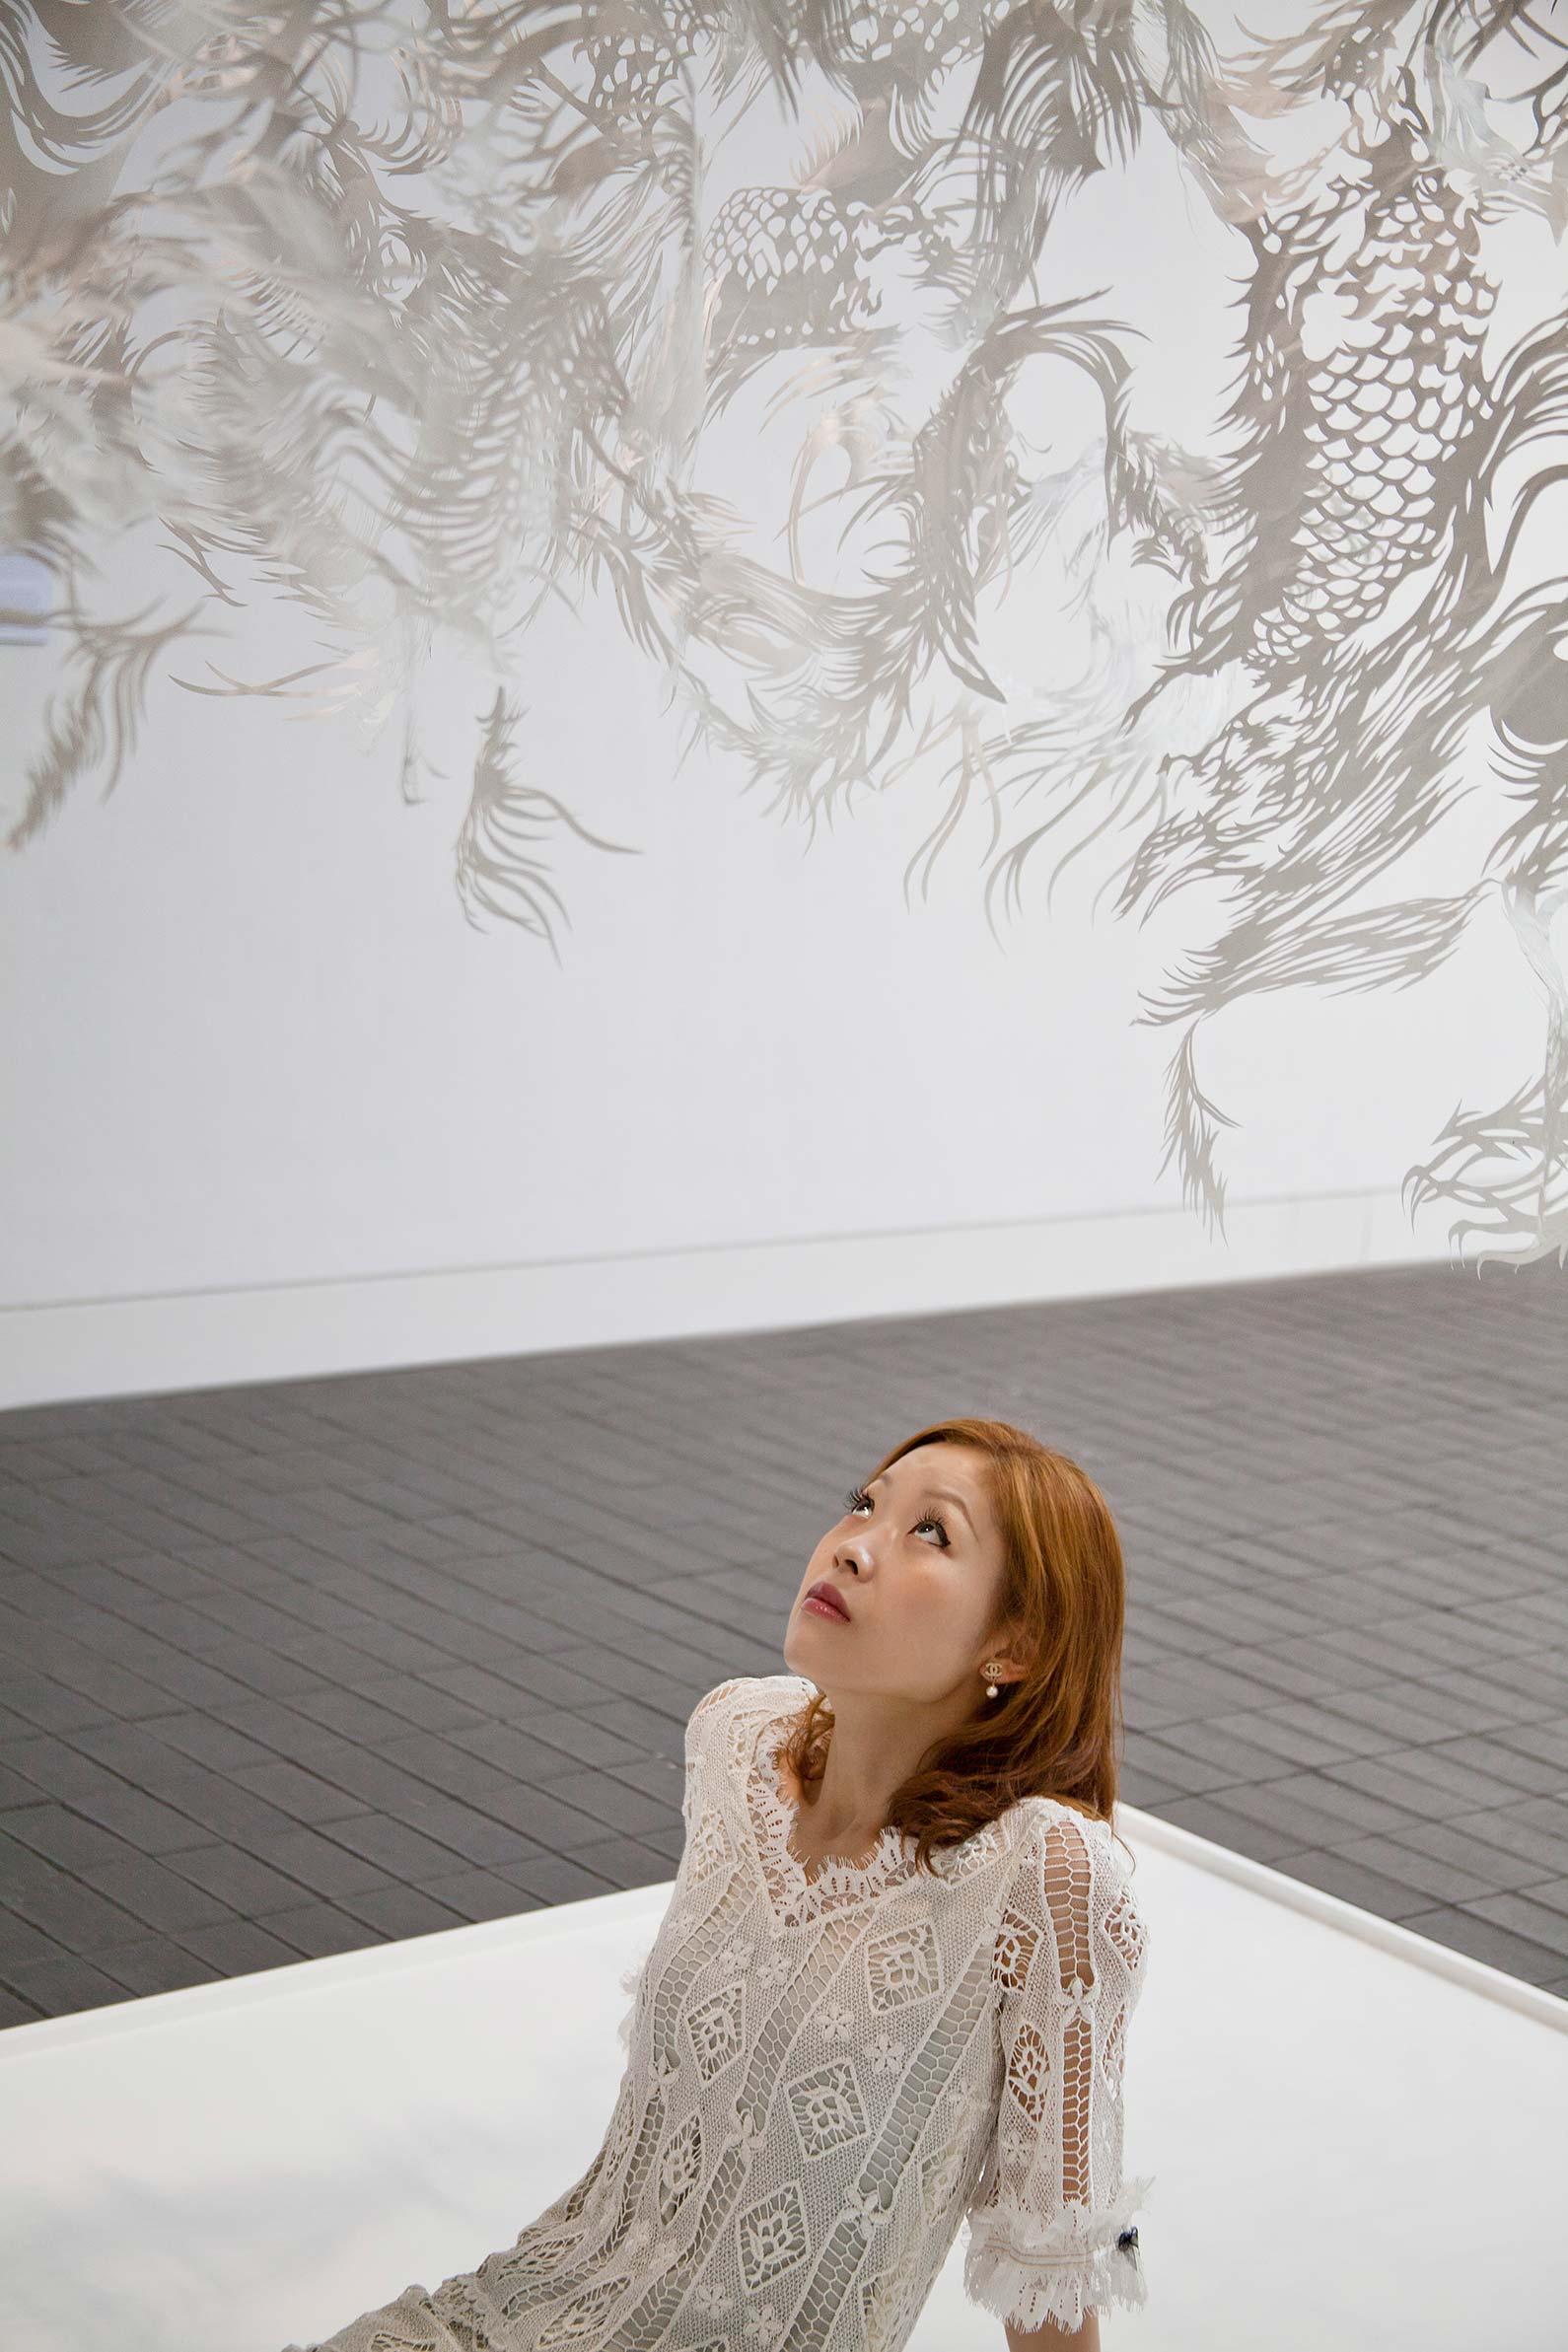 Paper Cut - Japanese Artist - Nahoko Kojima